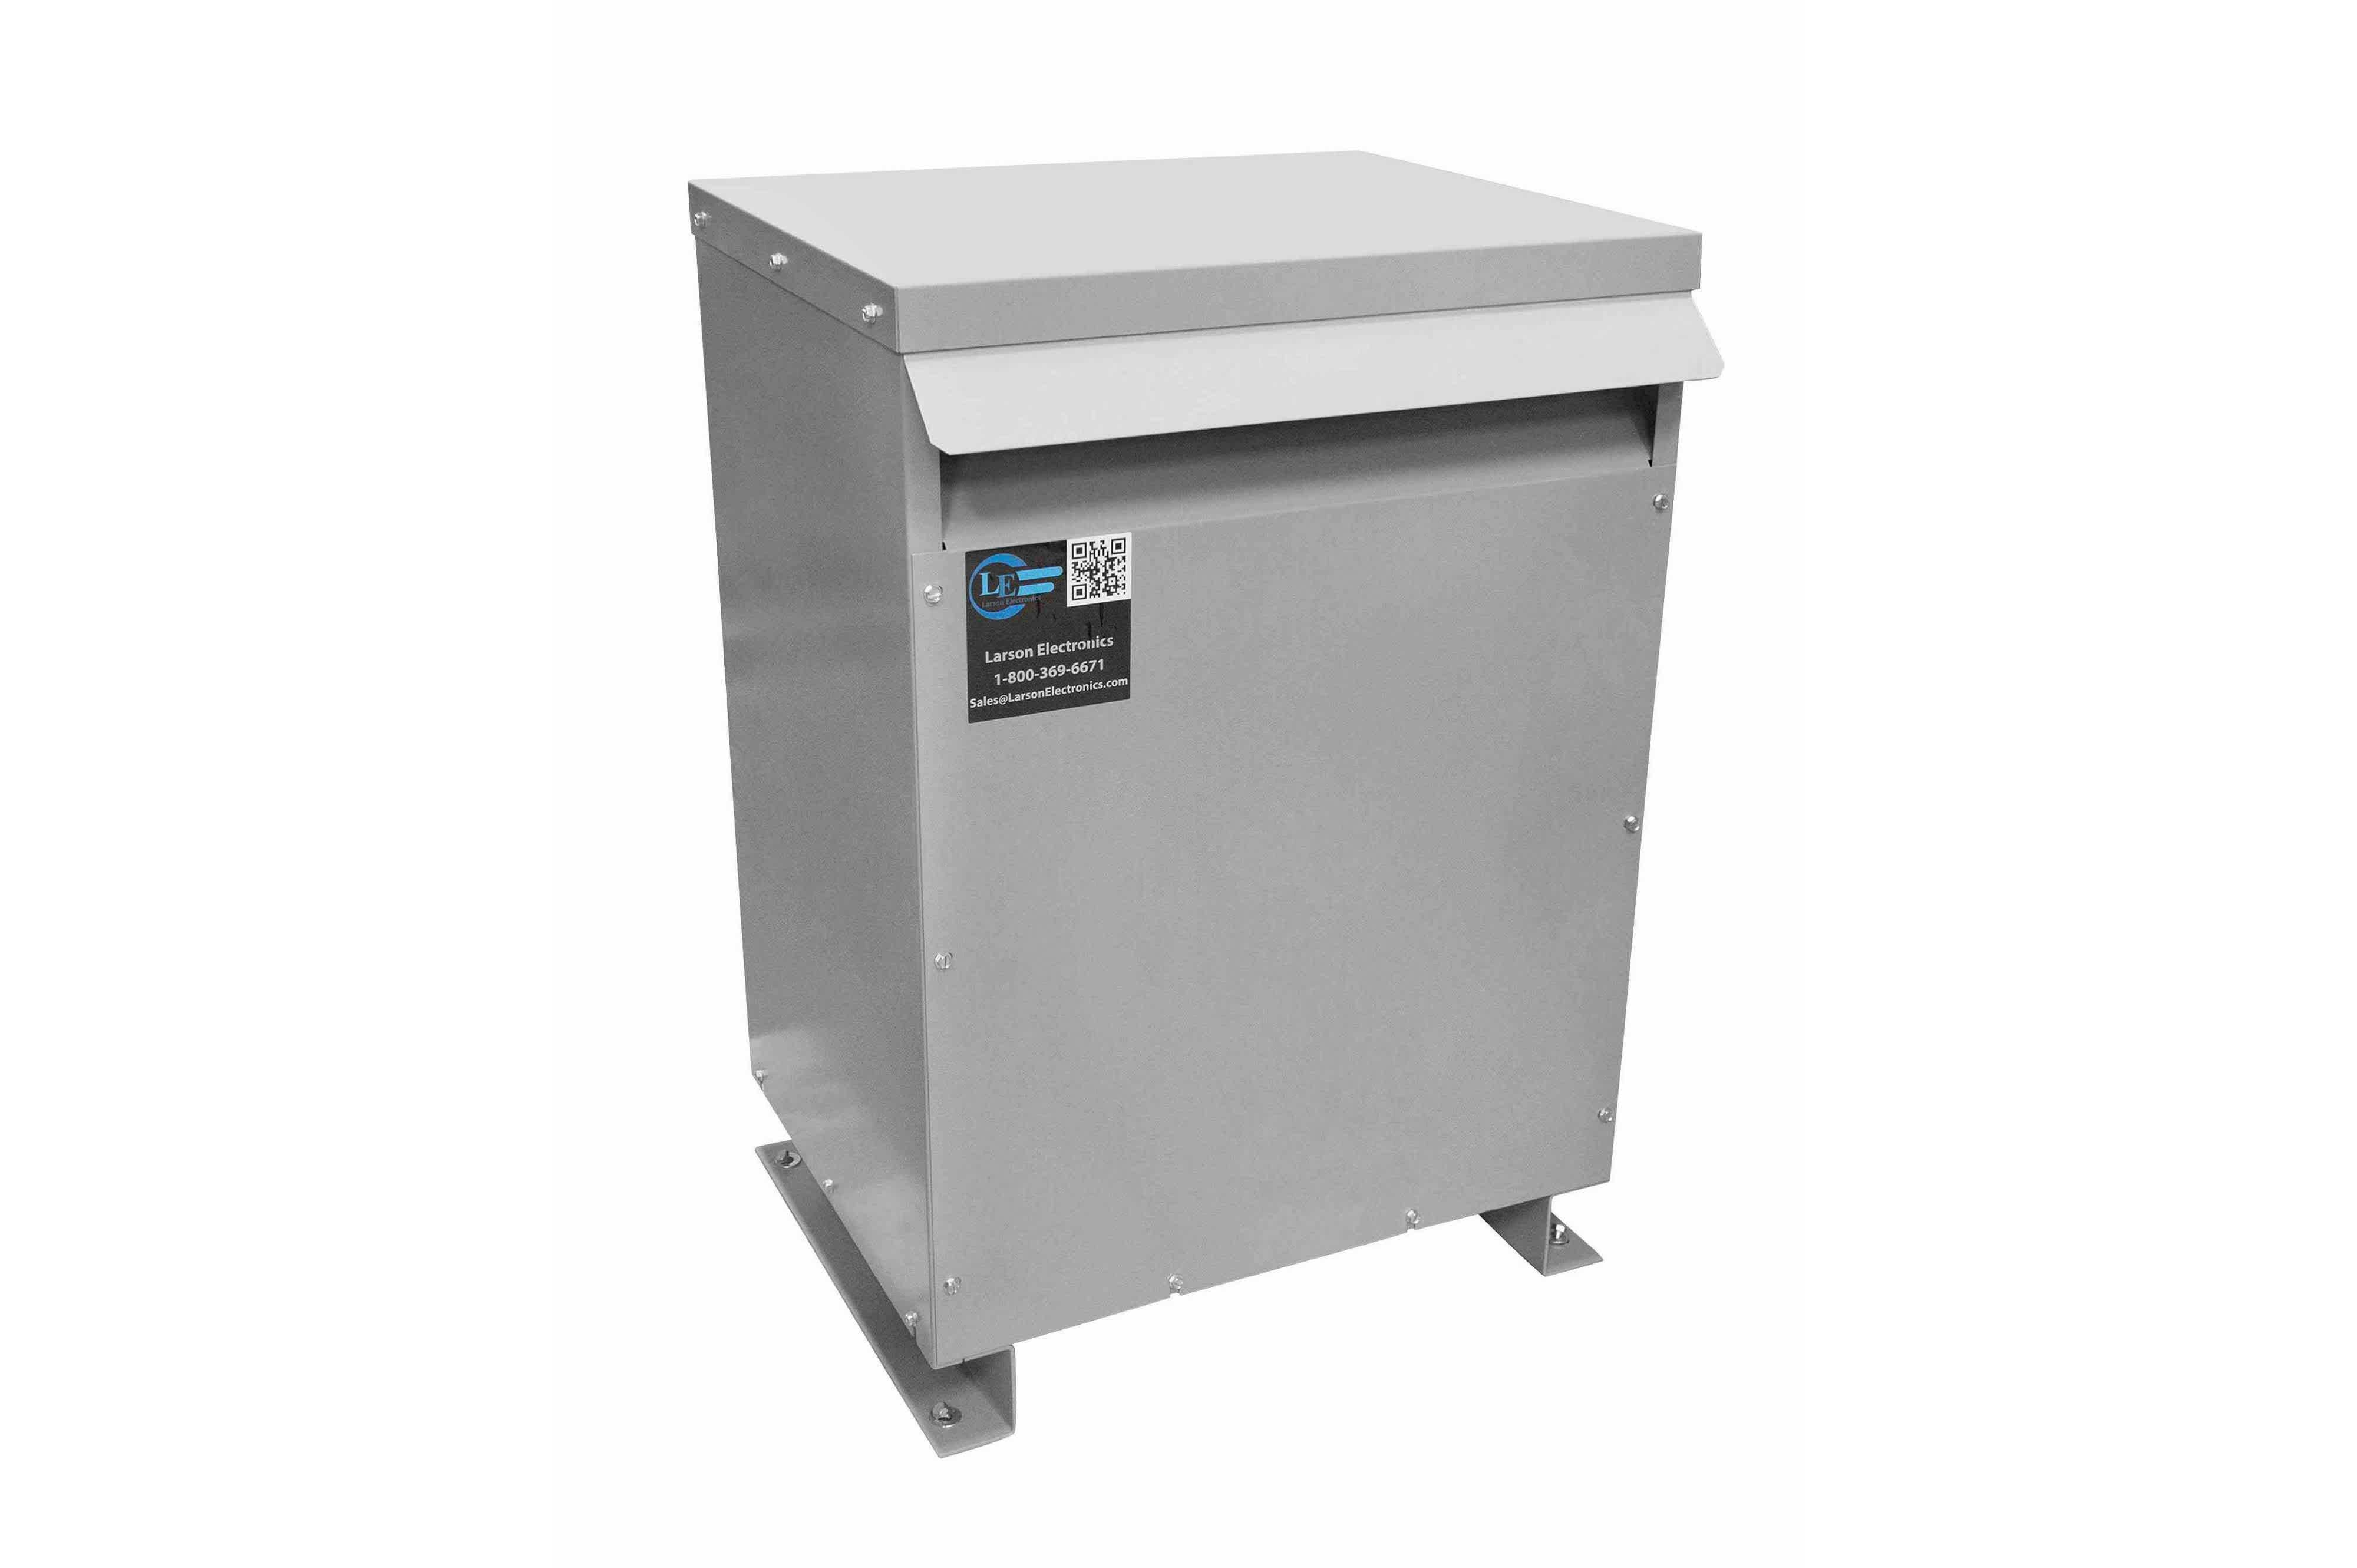 42.5 kVA 3PH Isolation Transformer, 230V Wye Primary, 480Y/277 Wye-N Secondary, N3R, Ventilated, 60 Hz